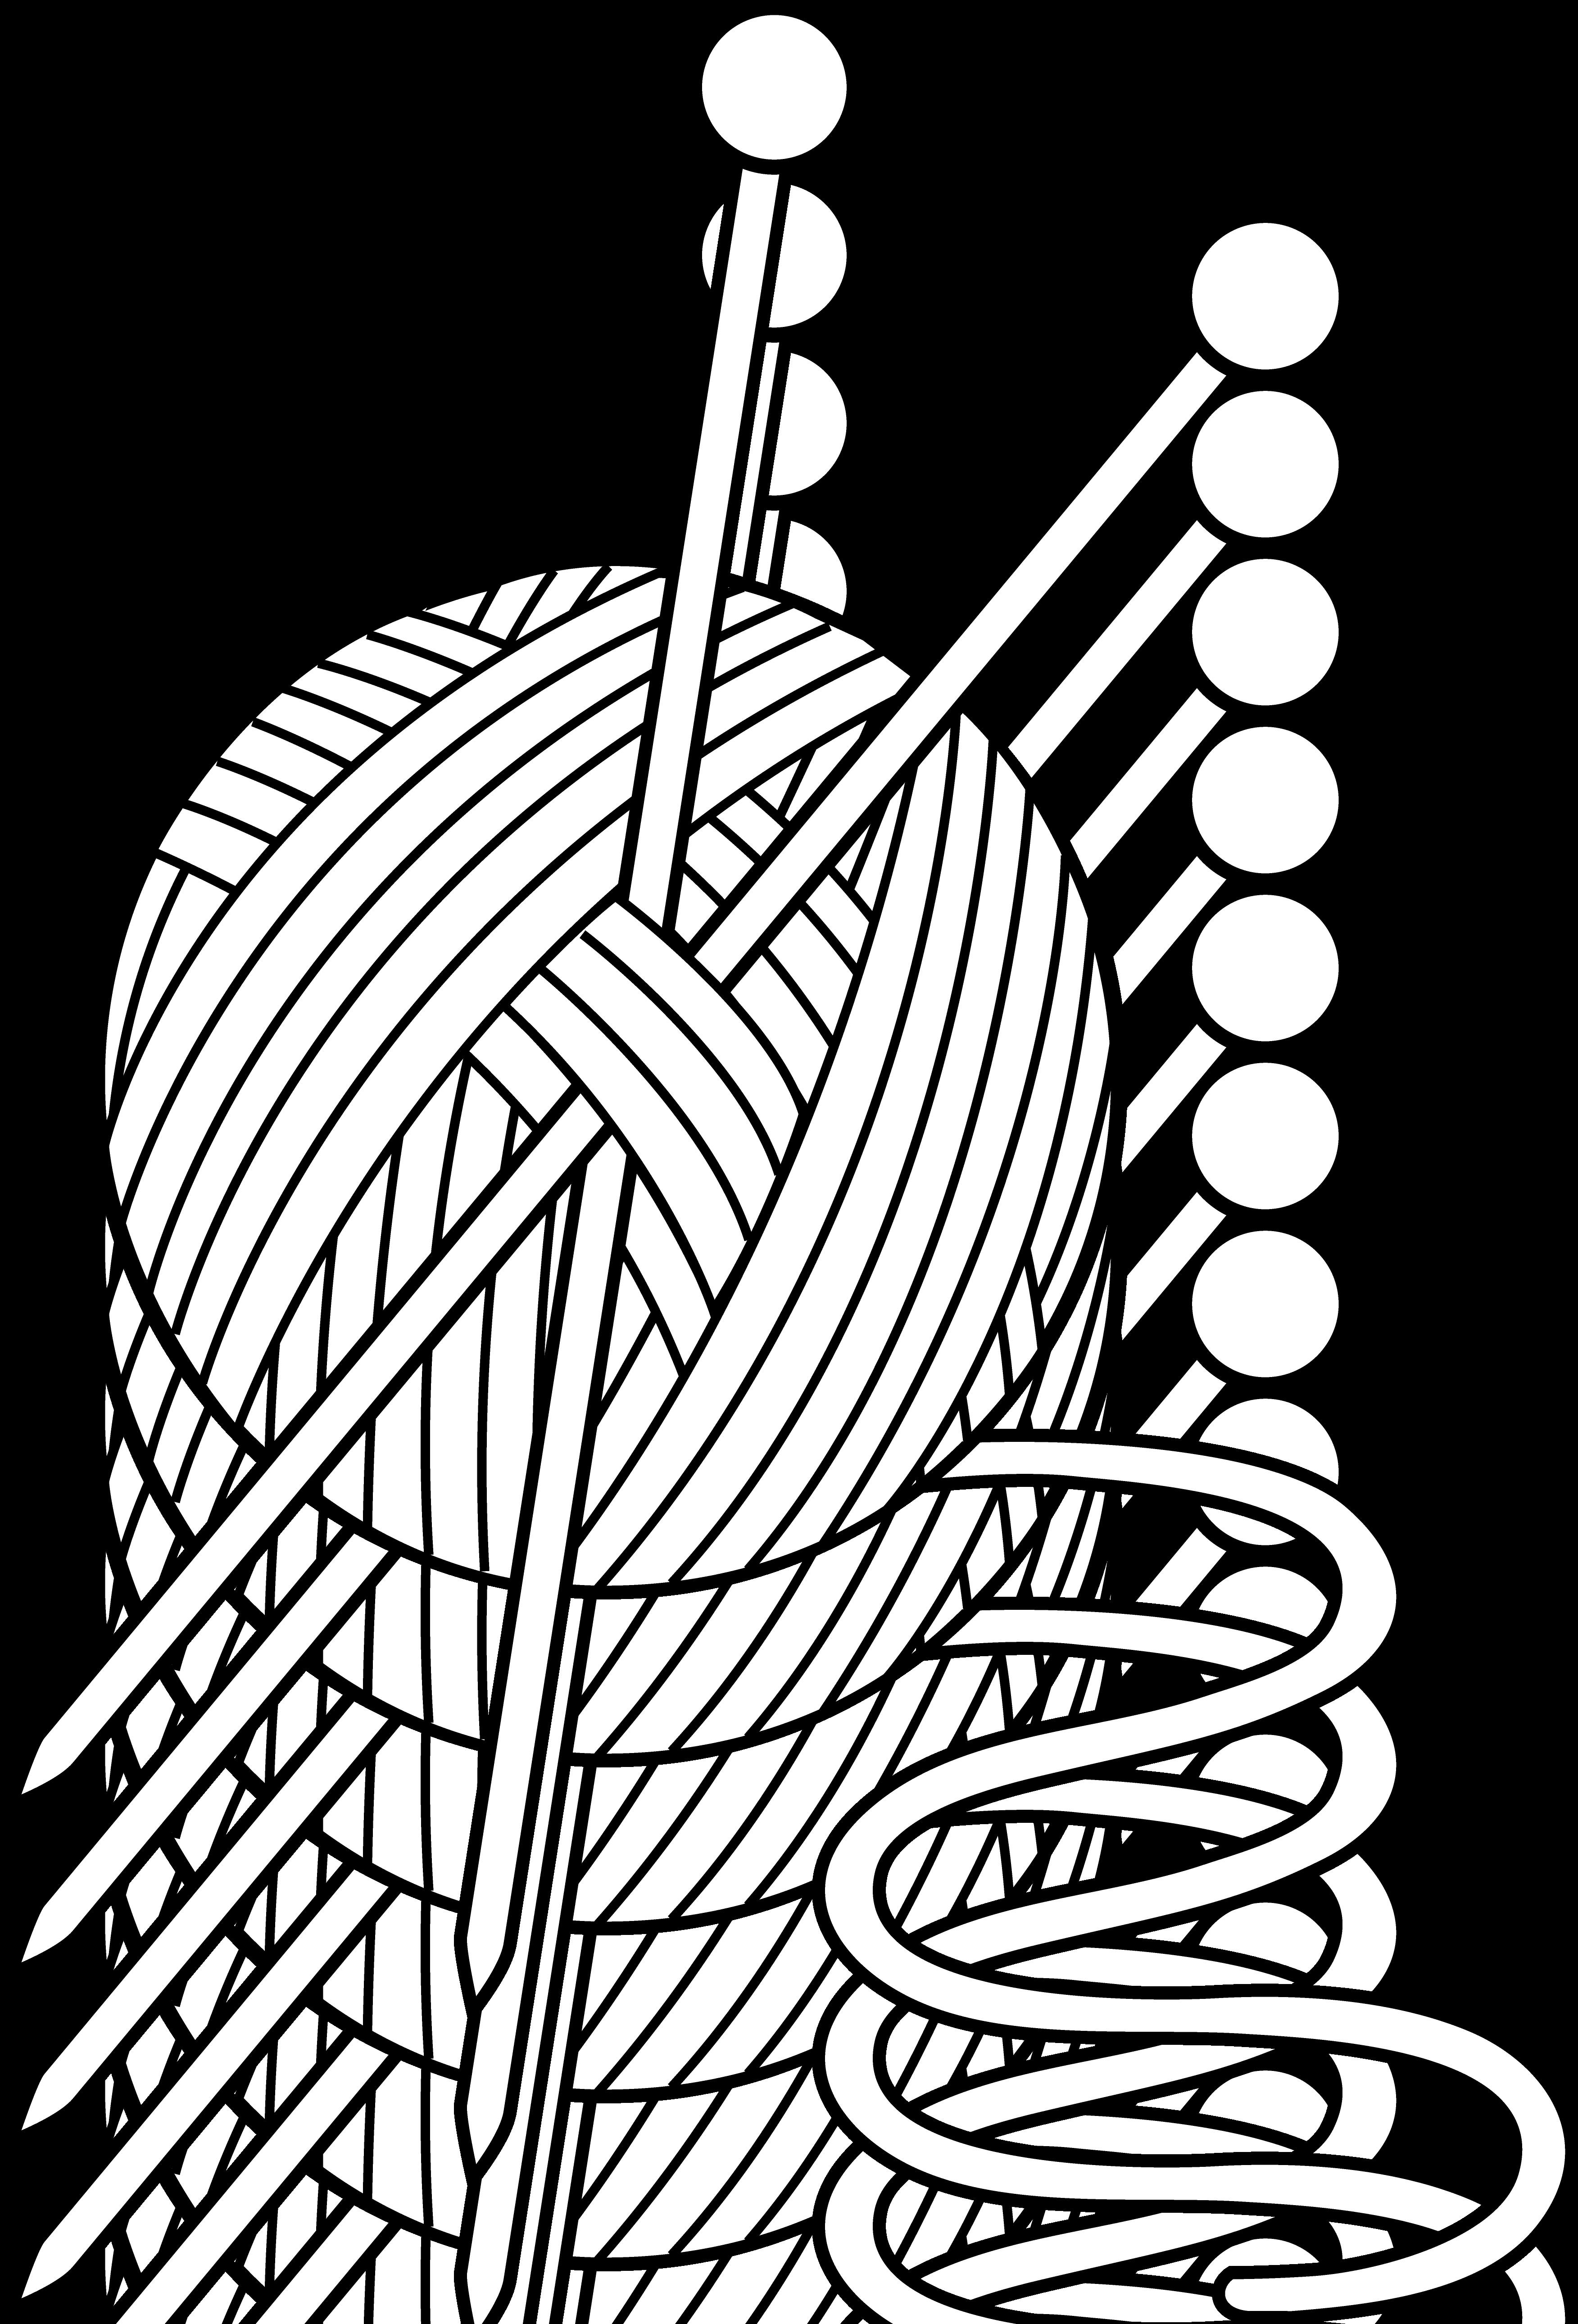 Crochet clipart logo cartoon black and white graphic free Crochet clipart logo cartoon black and white - ClipartFest graphic free